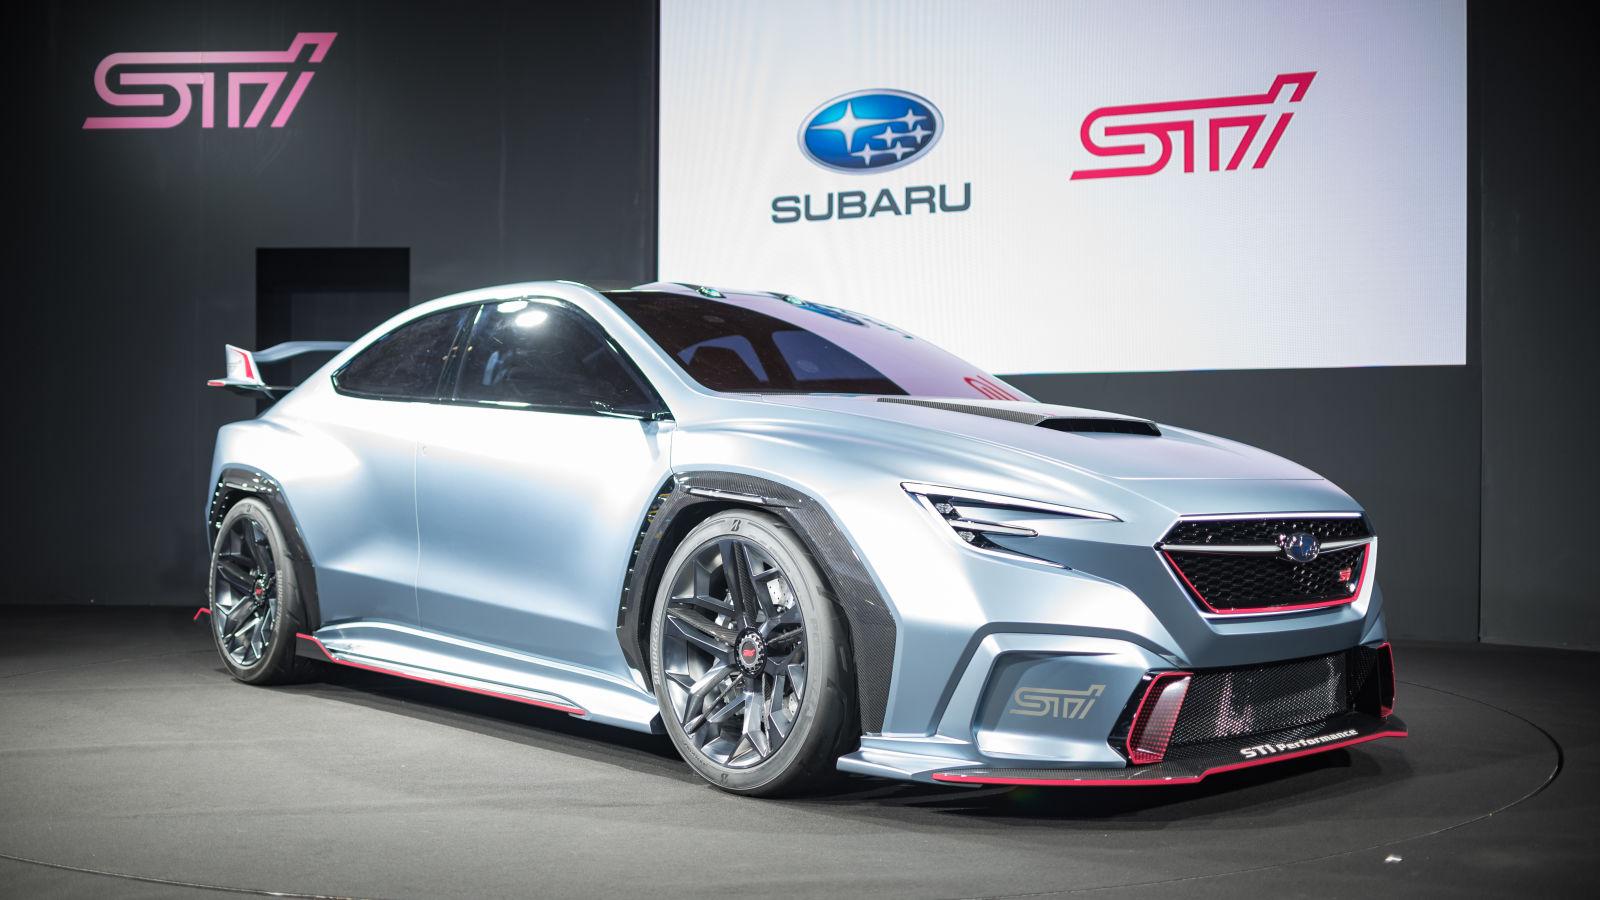 Subaru Brz Sti Price >> Subaru Viziv Performance Concept * Release date * Price